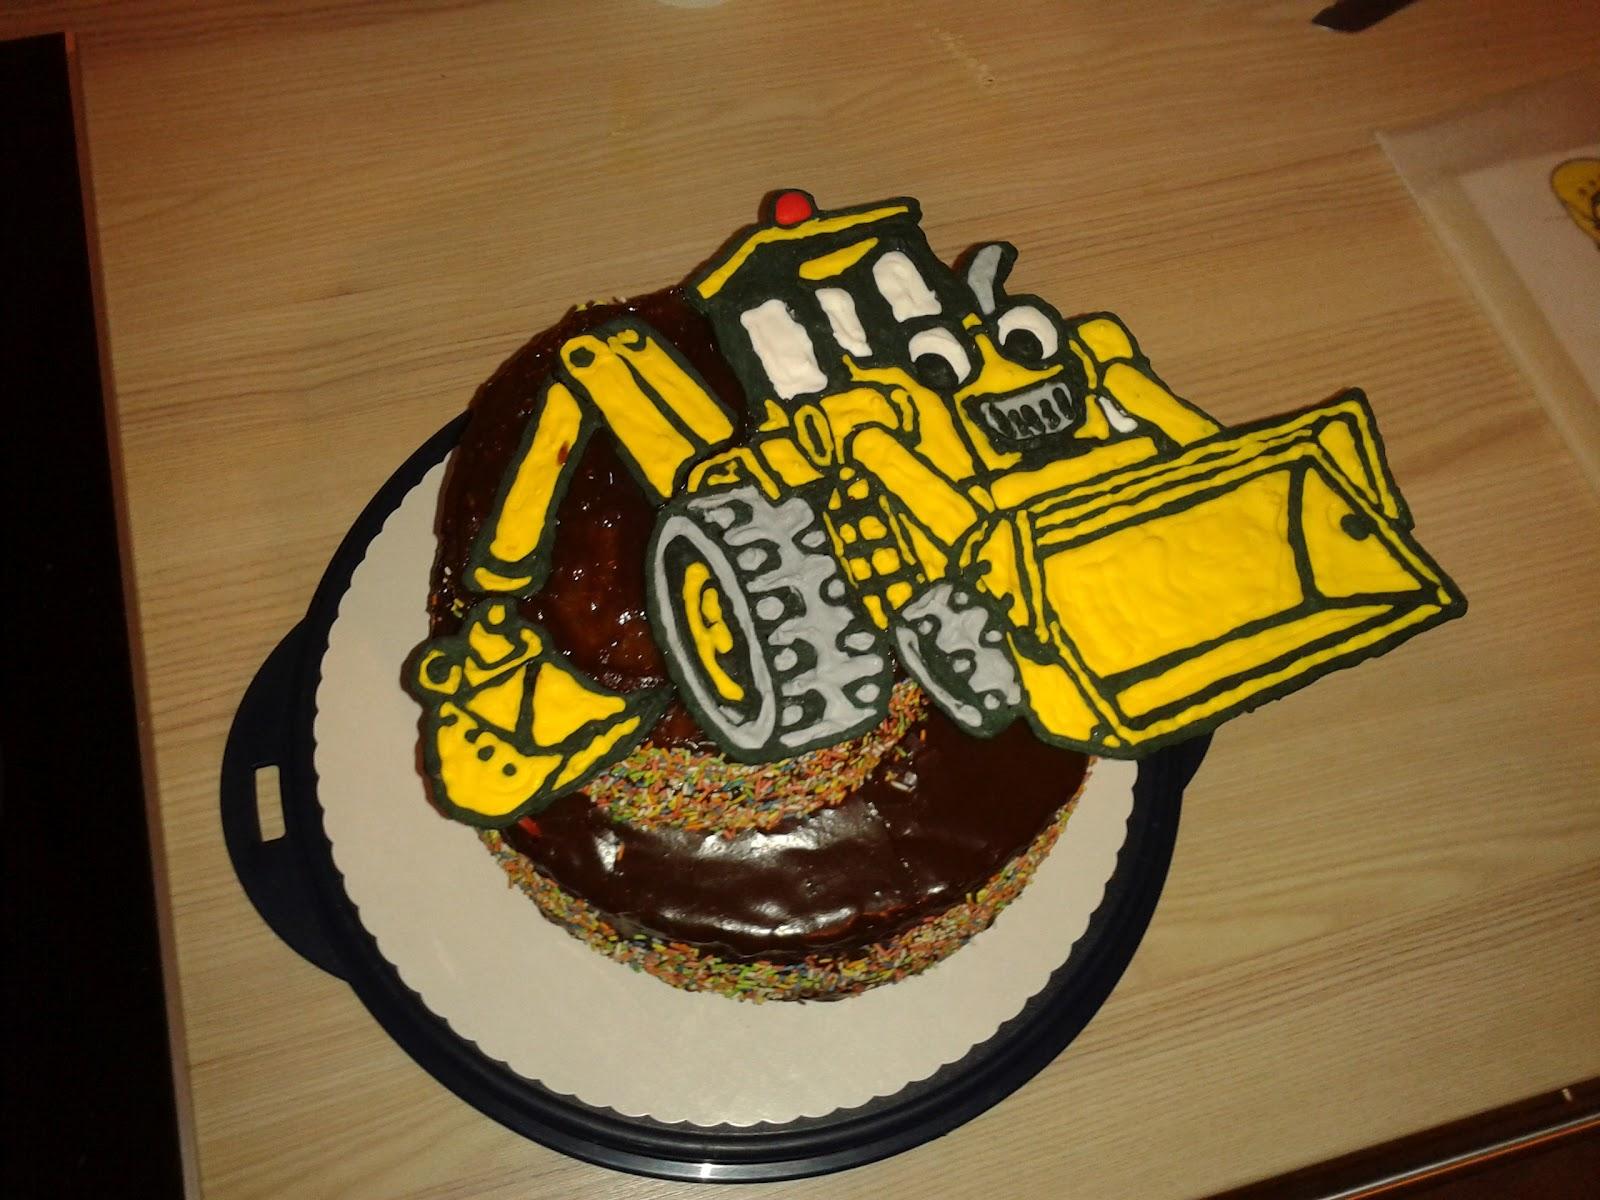 Corinas Backstube Bagger Torte